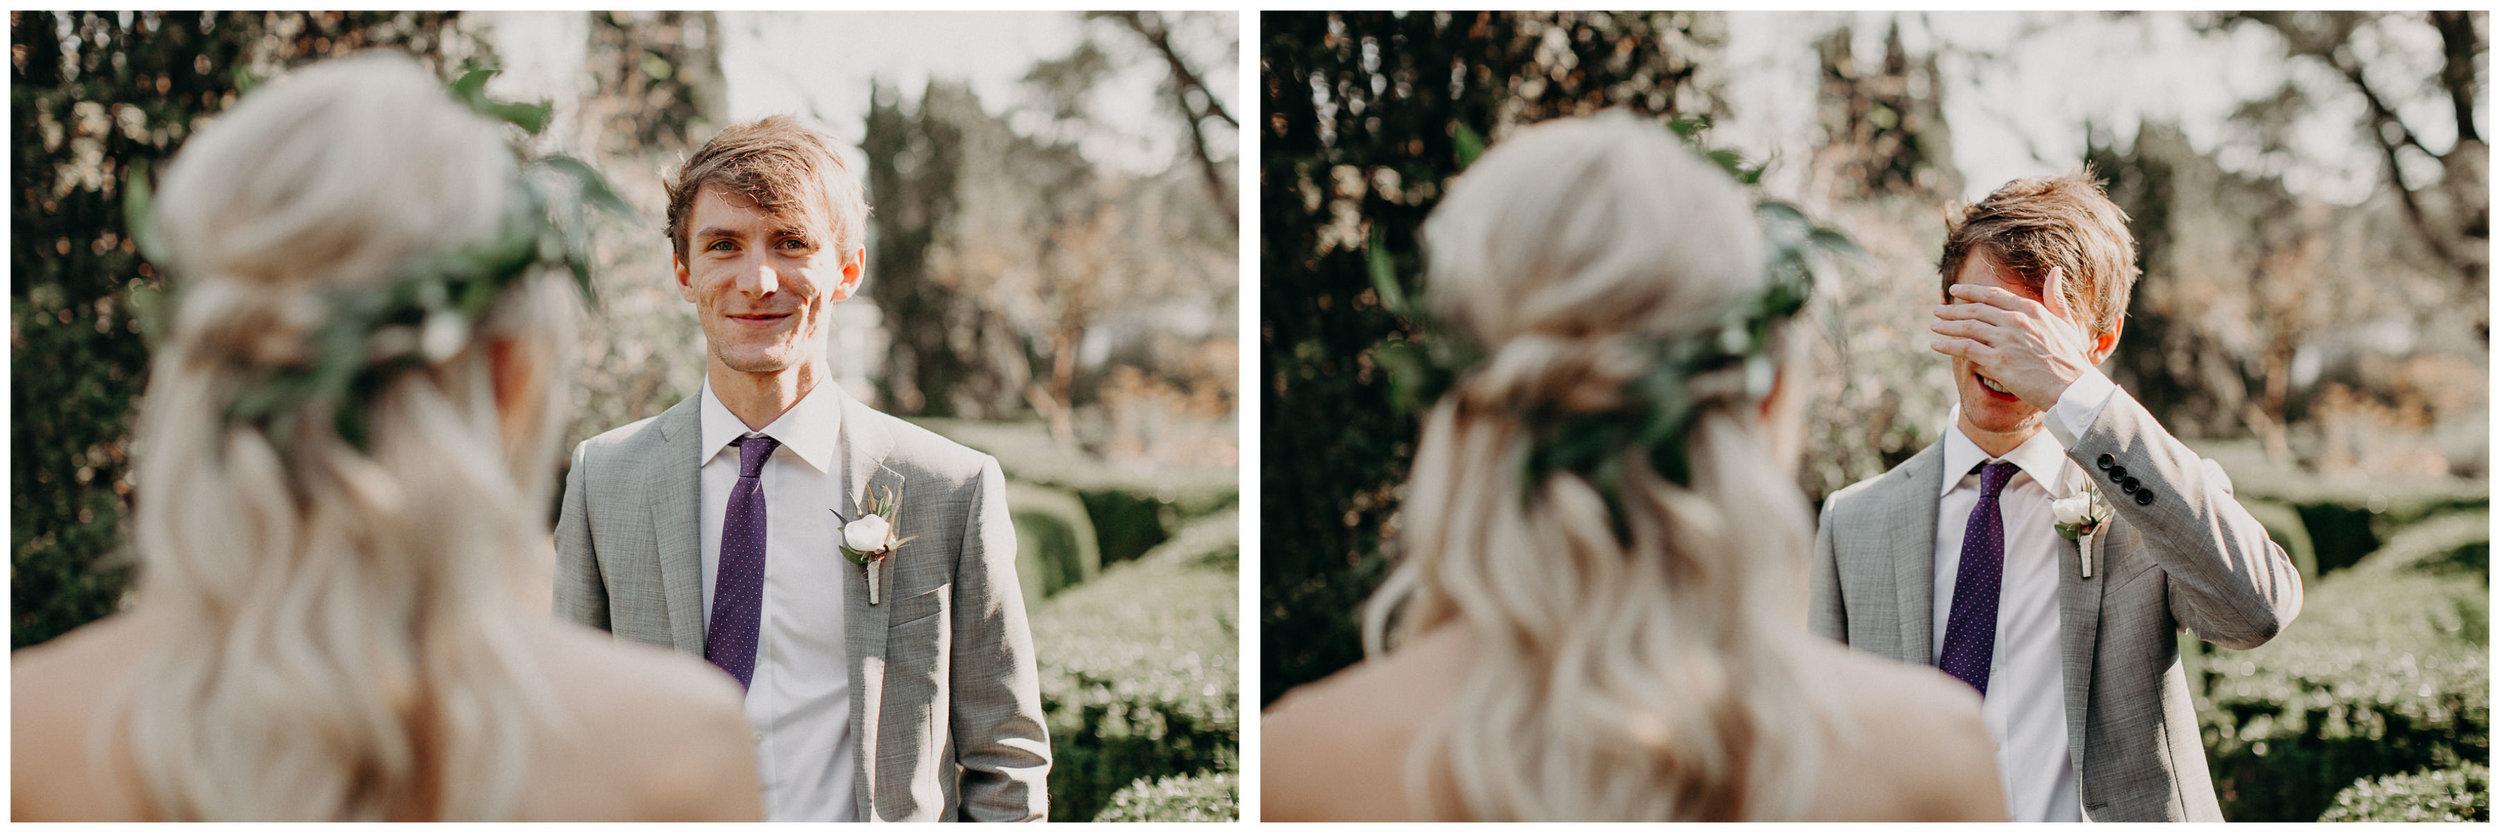 24 - Barnsley Gardens Wedding - Bride portraits - First Look .jpg